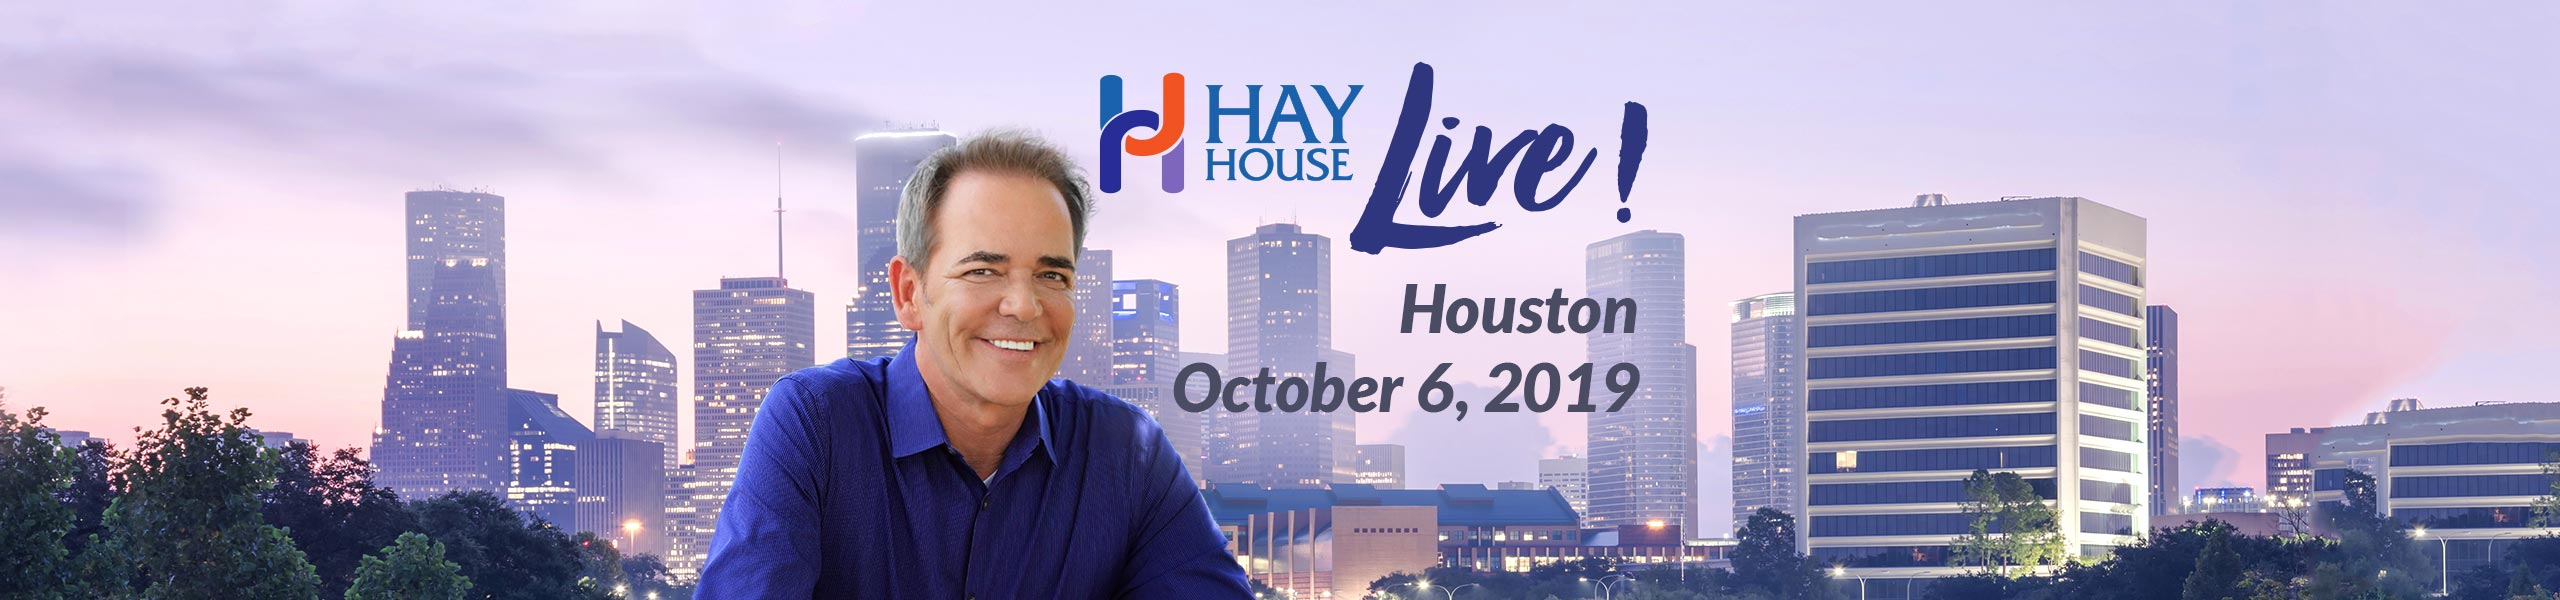 Hay House Live! Houston 2019 - John Holland